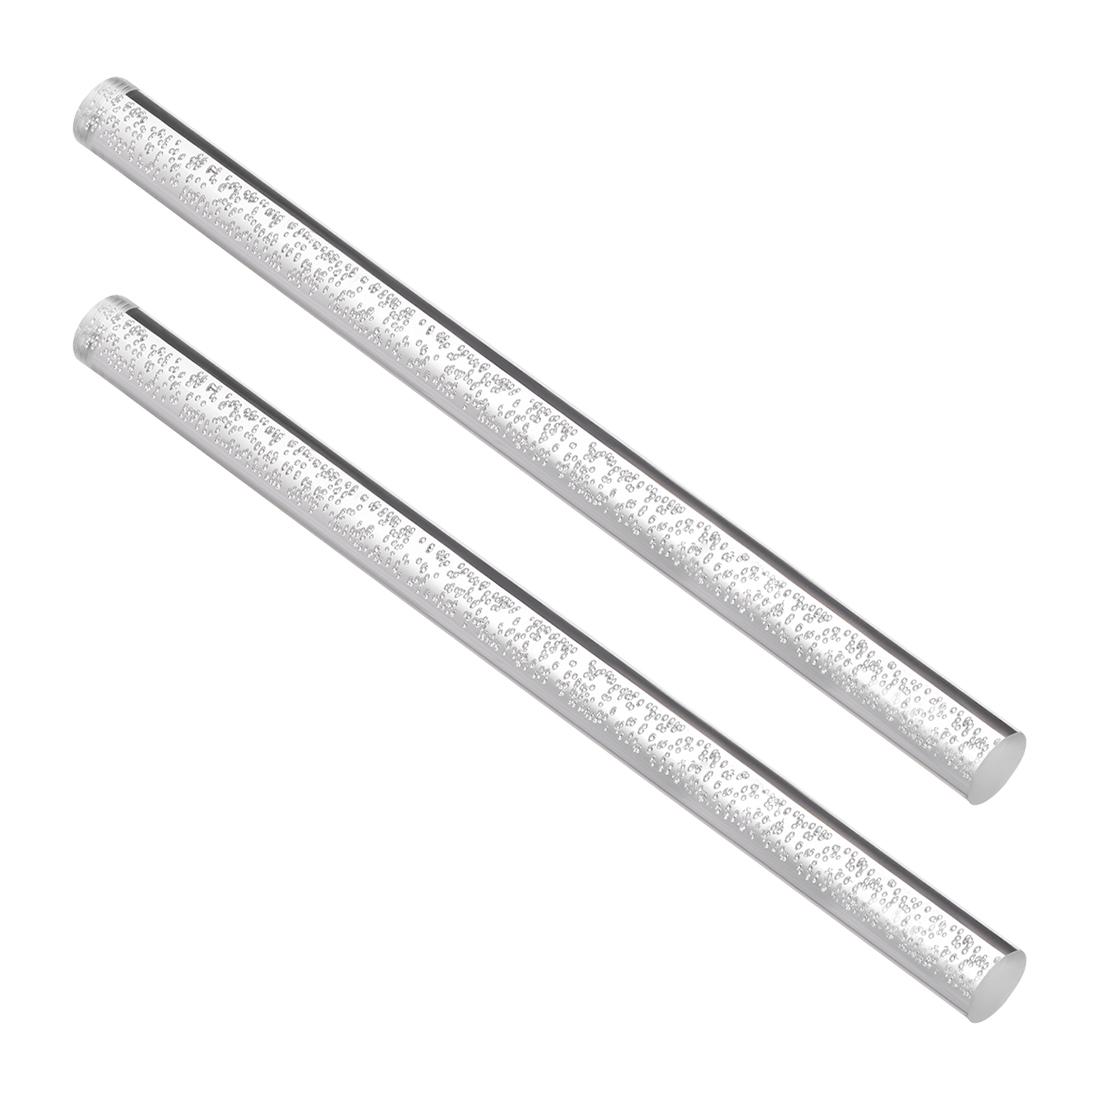 15mm Dia 250mm Long Air Bubble Acrylic Rod PMMA Circular Bar Clear 2pcs